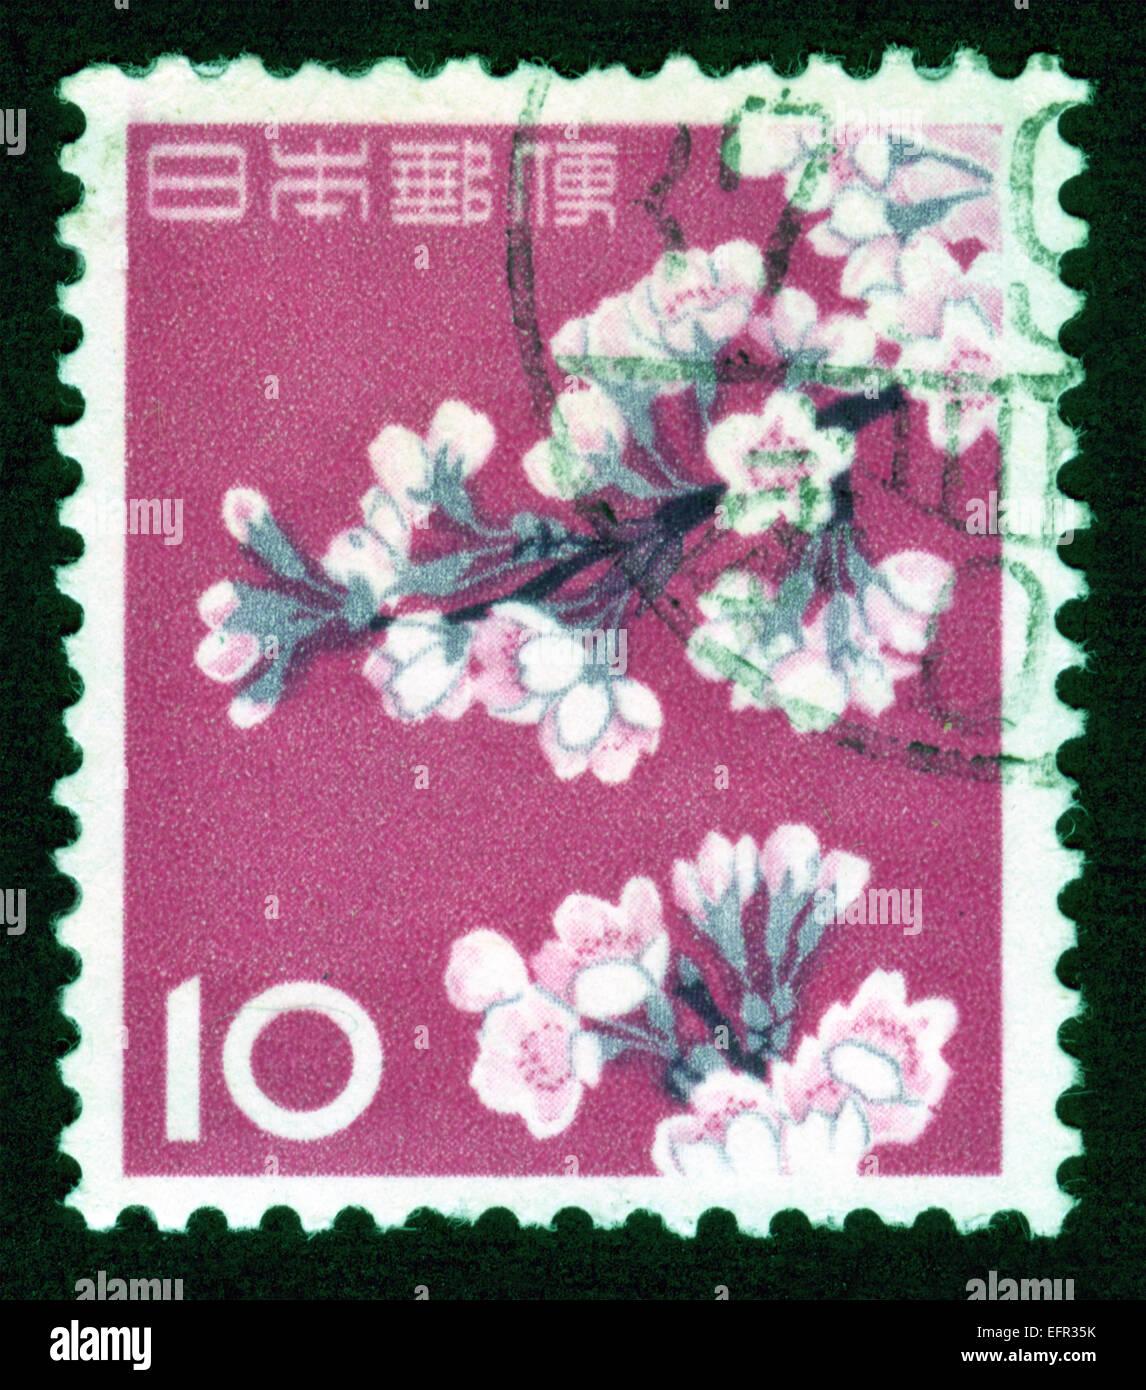 japan post mark postage stamp flowers plants flora flower stock